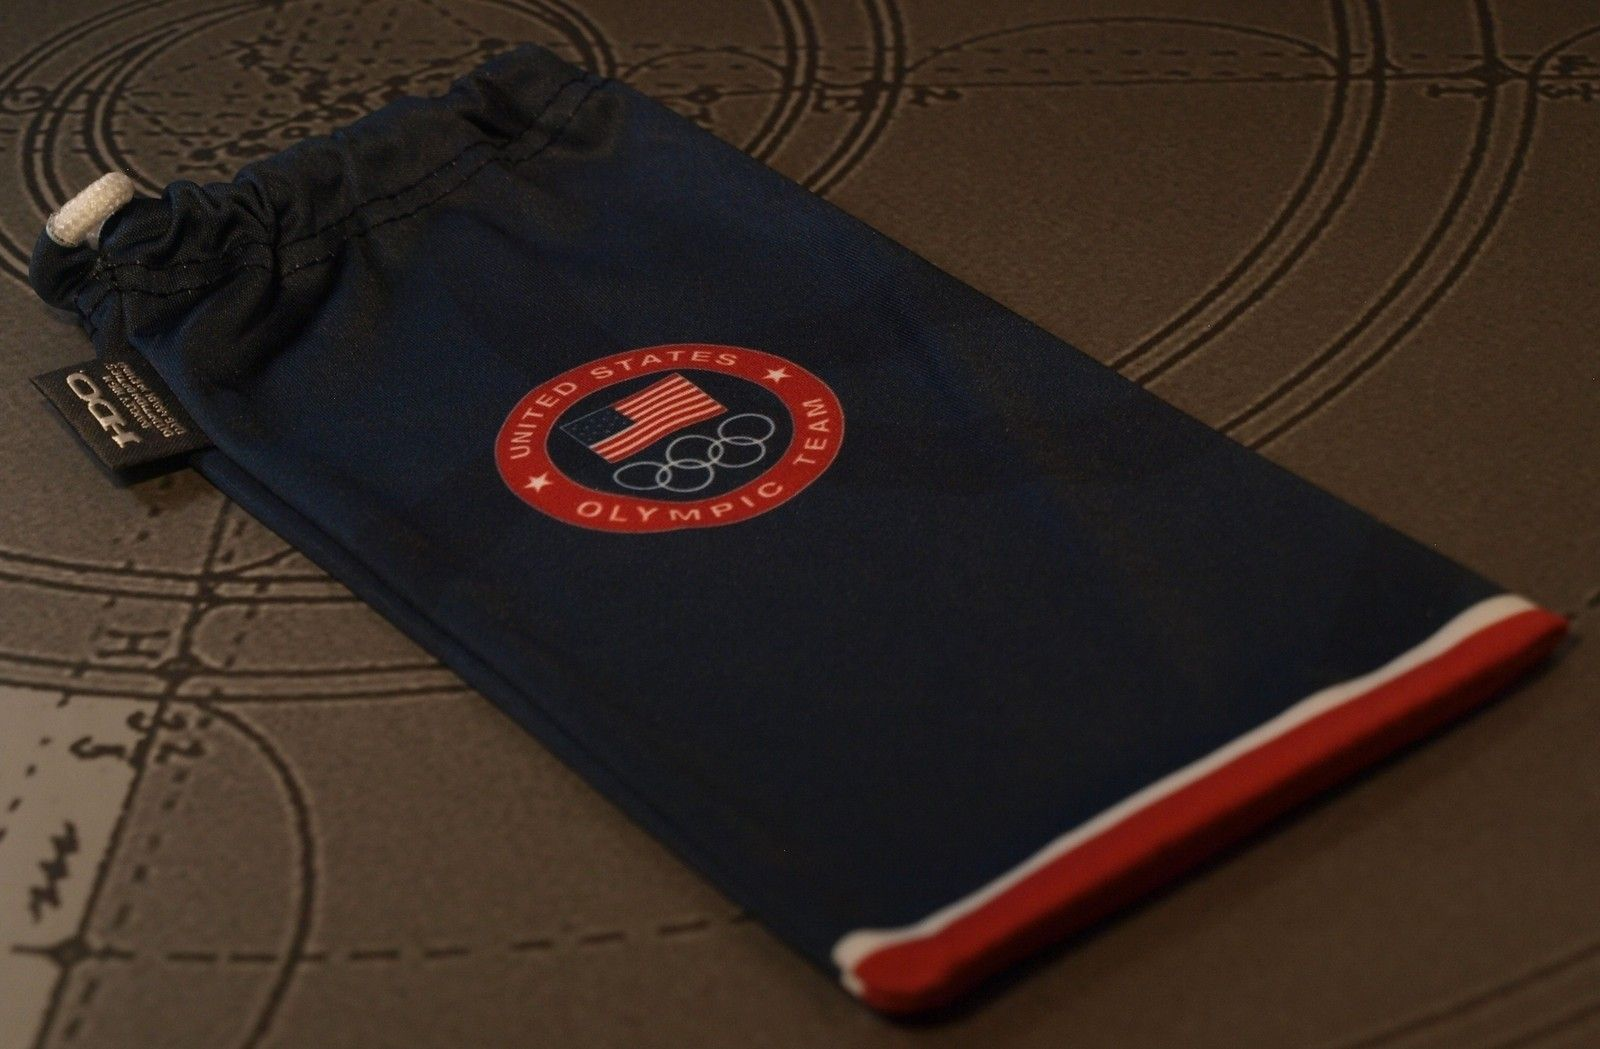 OAKLEY Olympic Microfiber Bag - olympicmicro.jpg